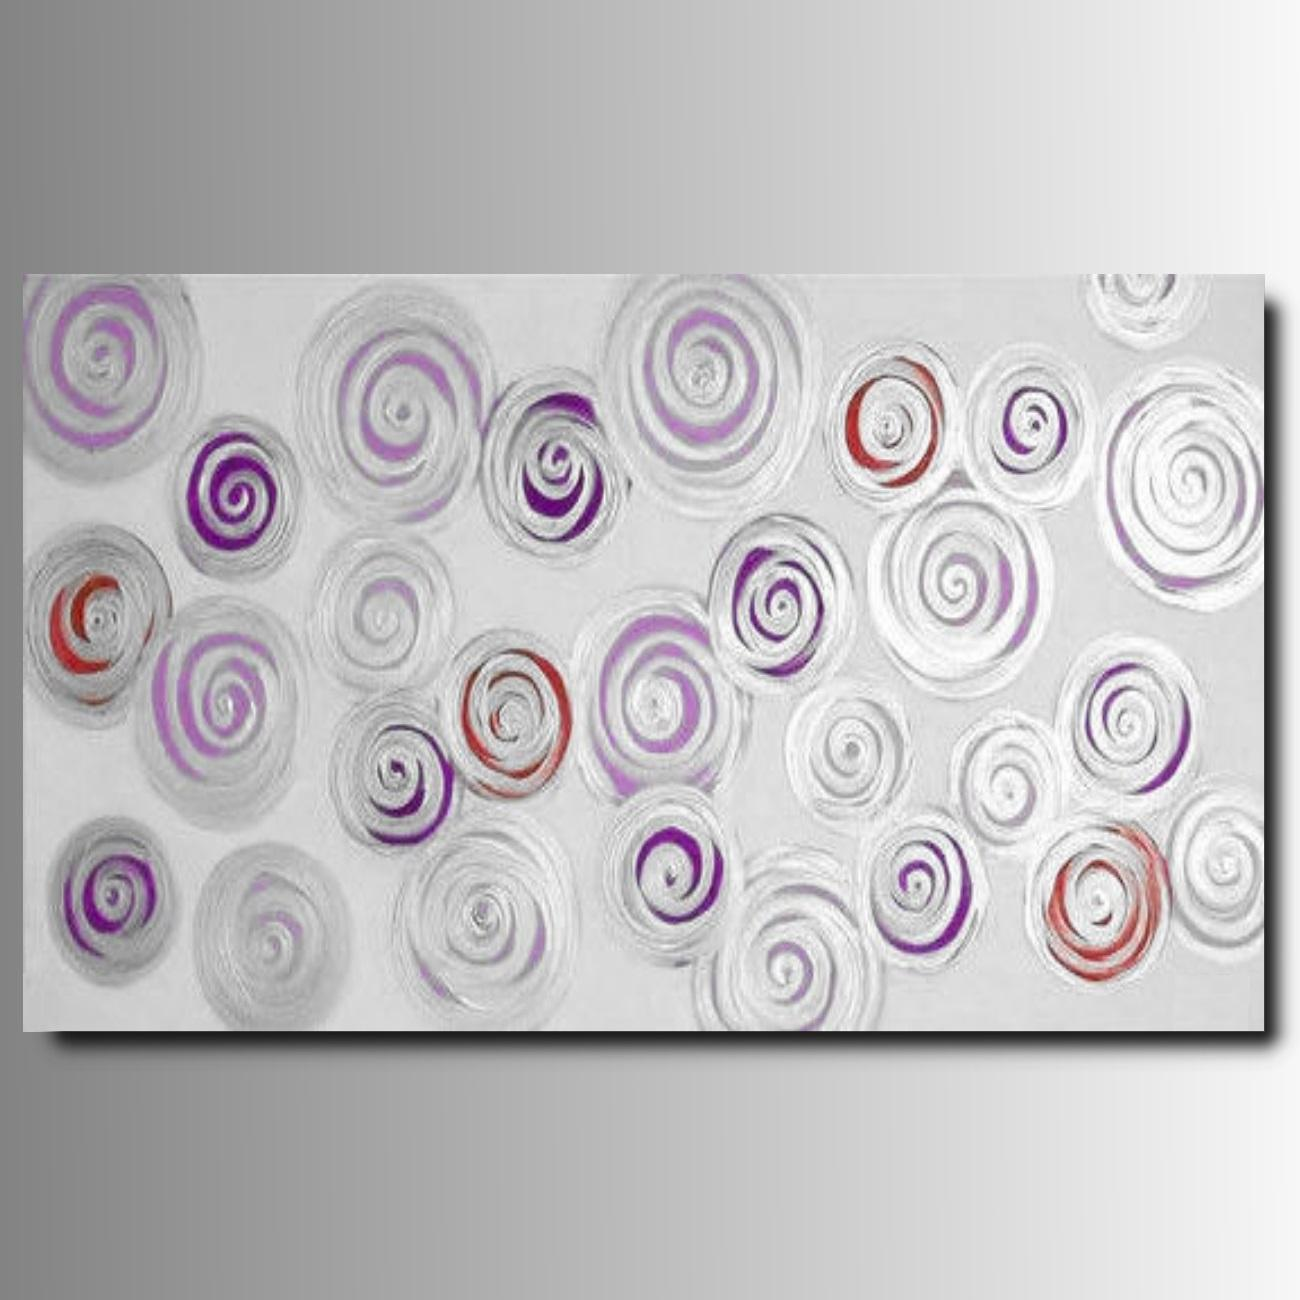 Quadro Moderno Dipinto A Mano.1 Quadro Moderno Dipinto A Mano Spirali Colorate